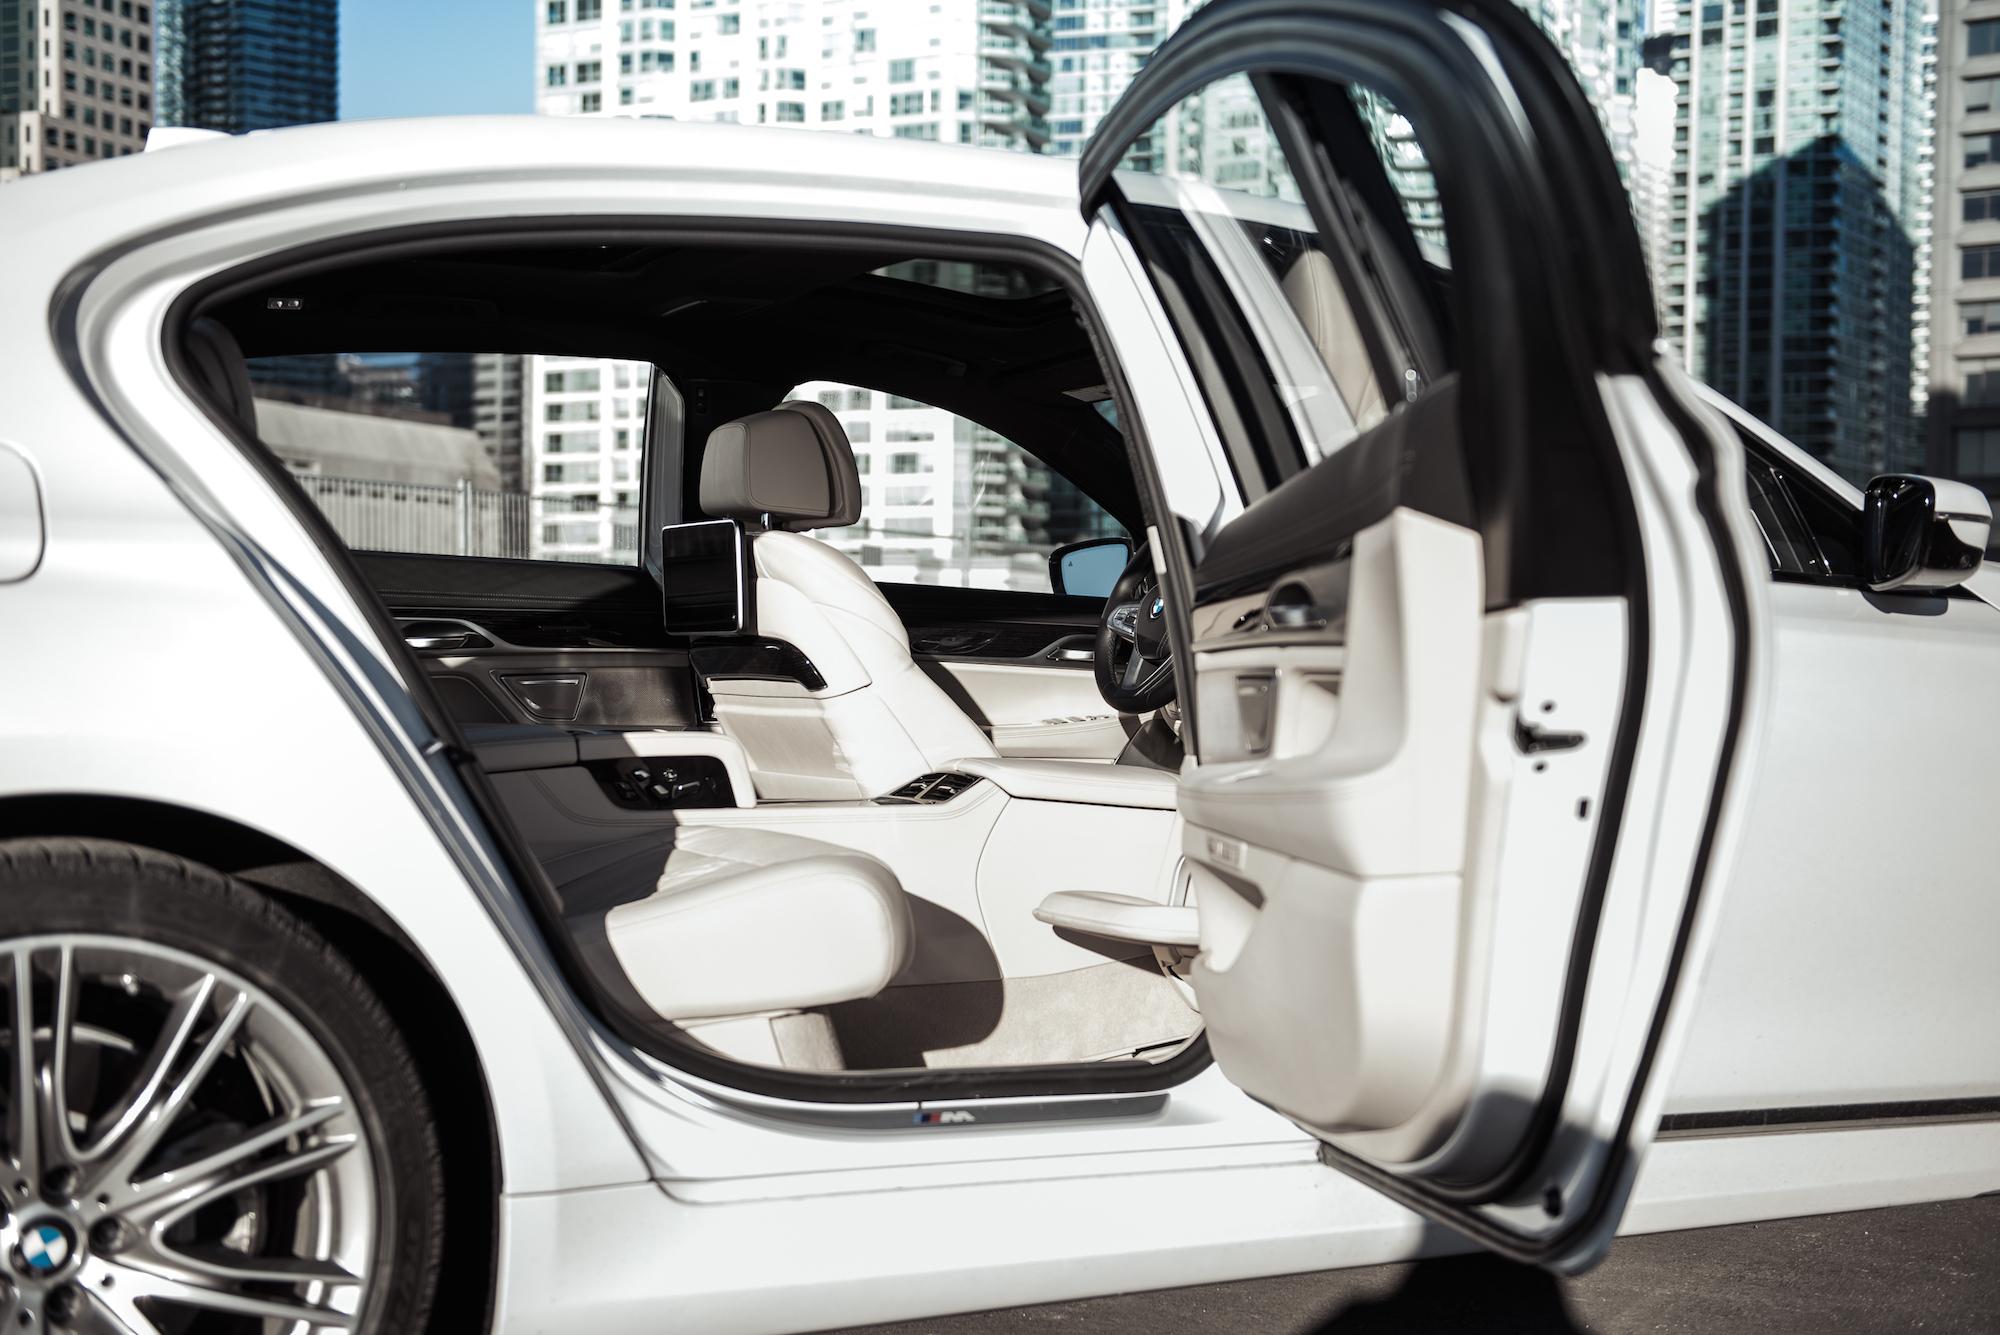 2017 BMW 7 Series Rear White Seats Leather